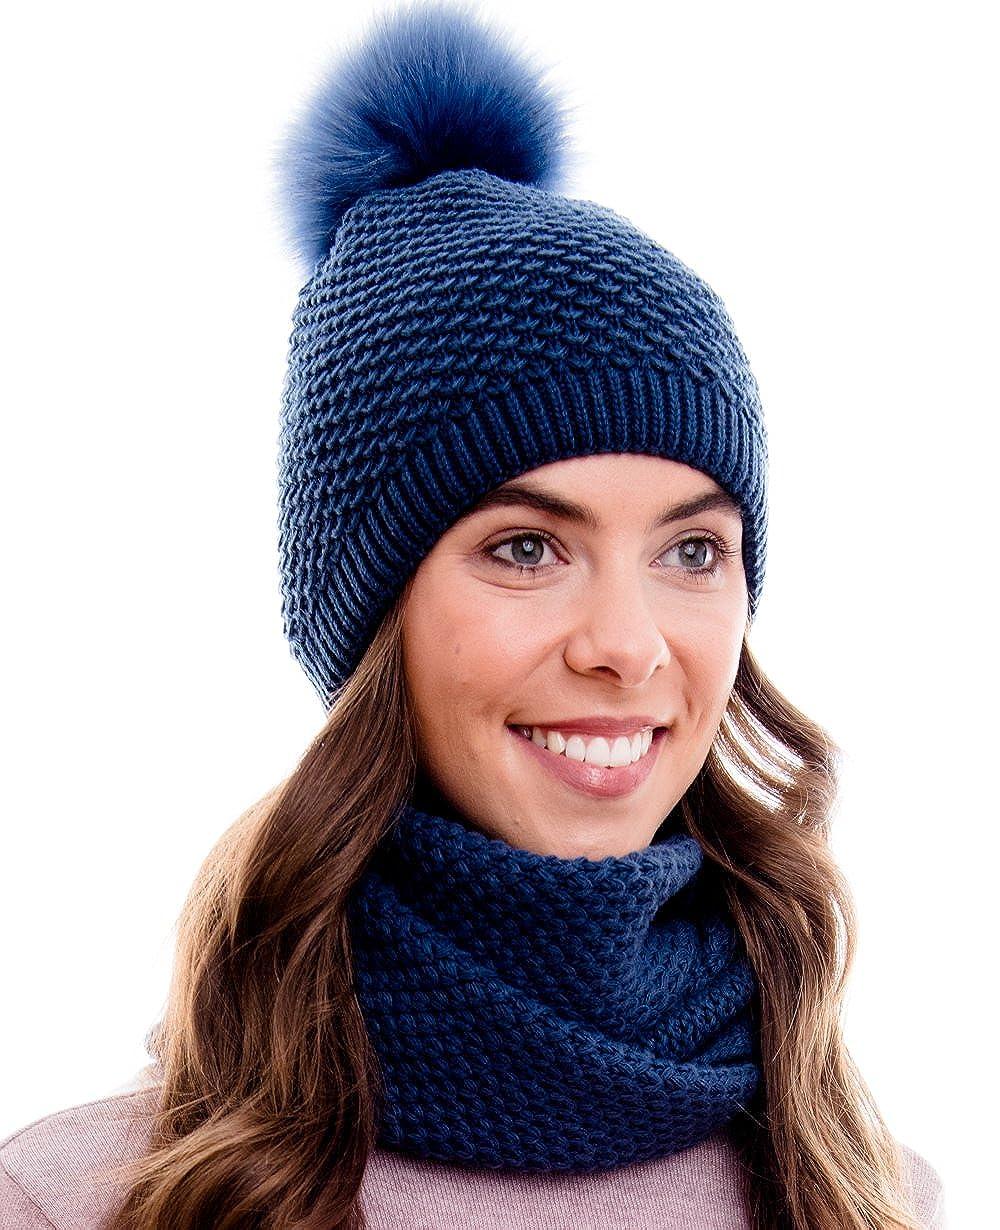 Hilltop Winter Loop-Schal Rundschal aus 100/% Baumwolle